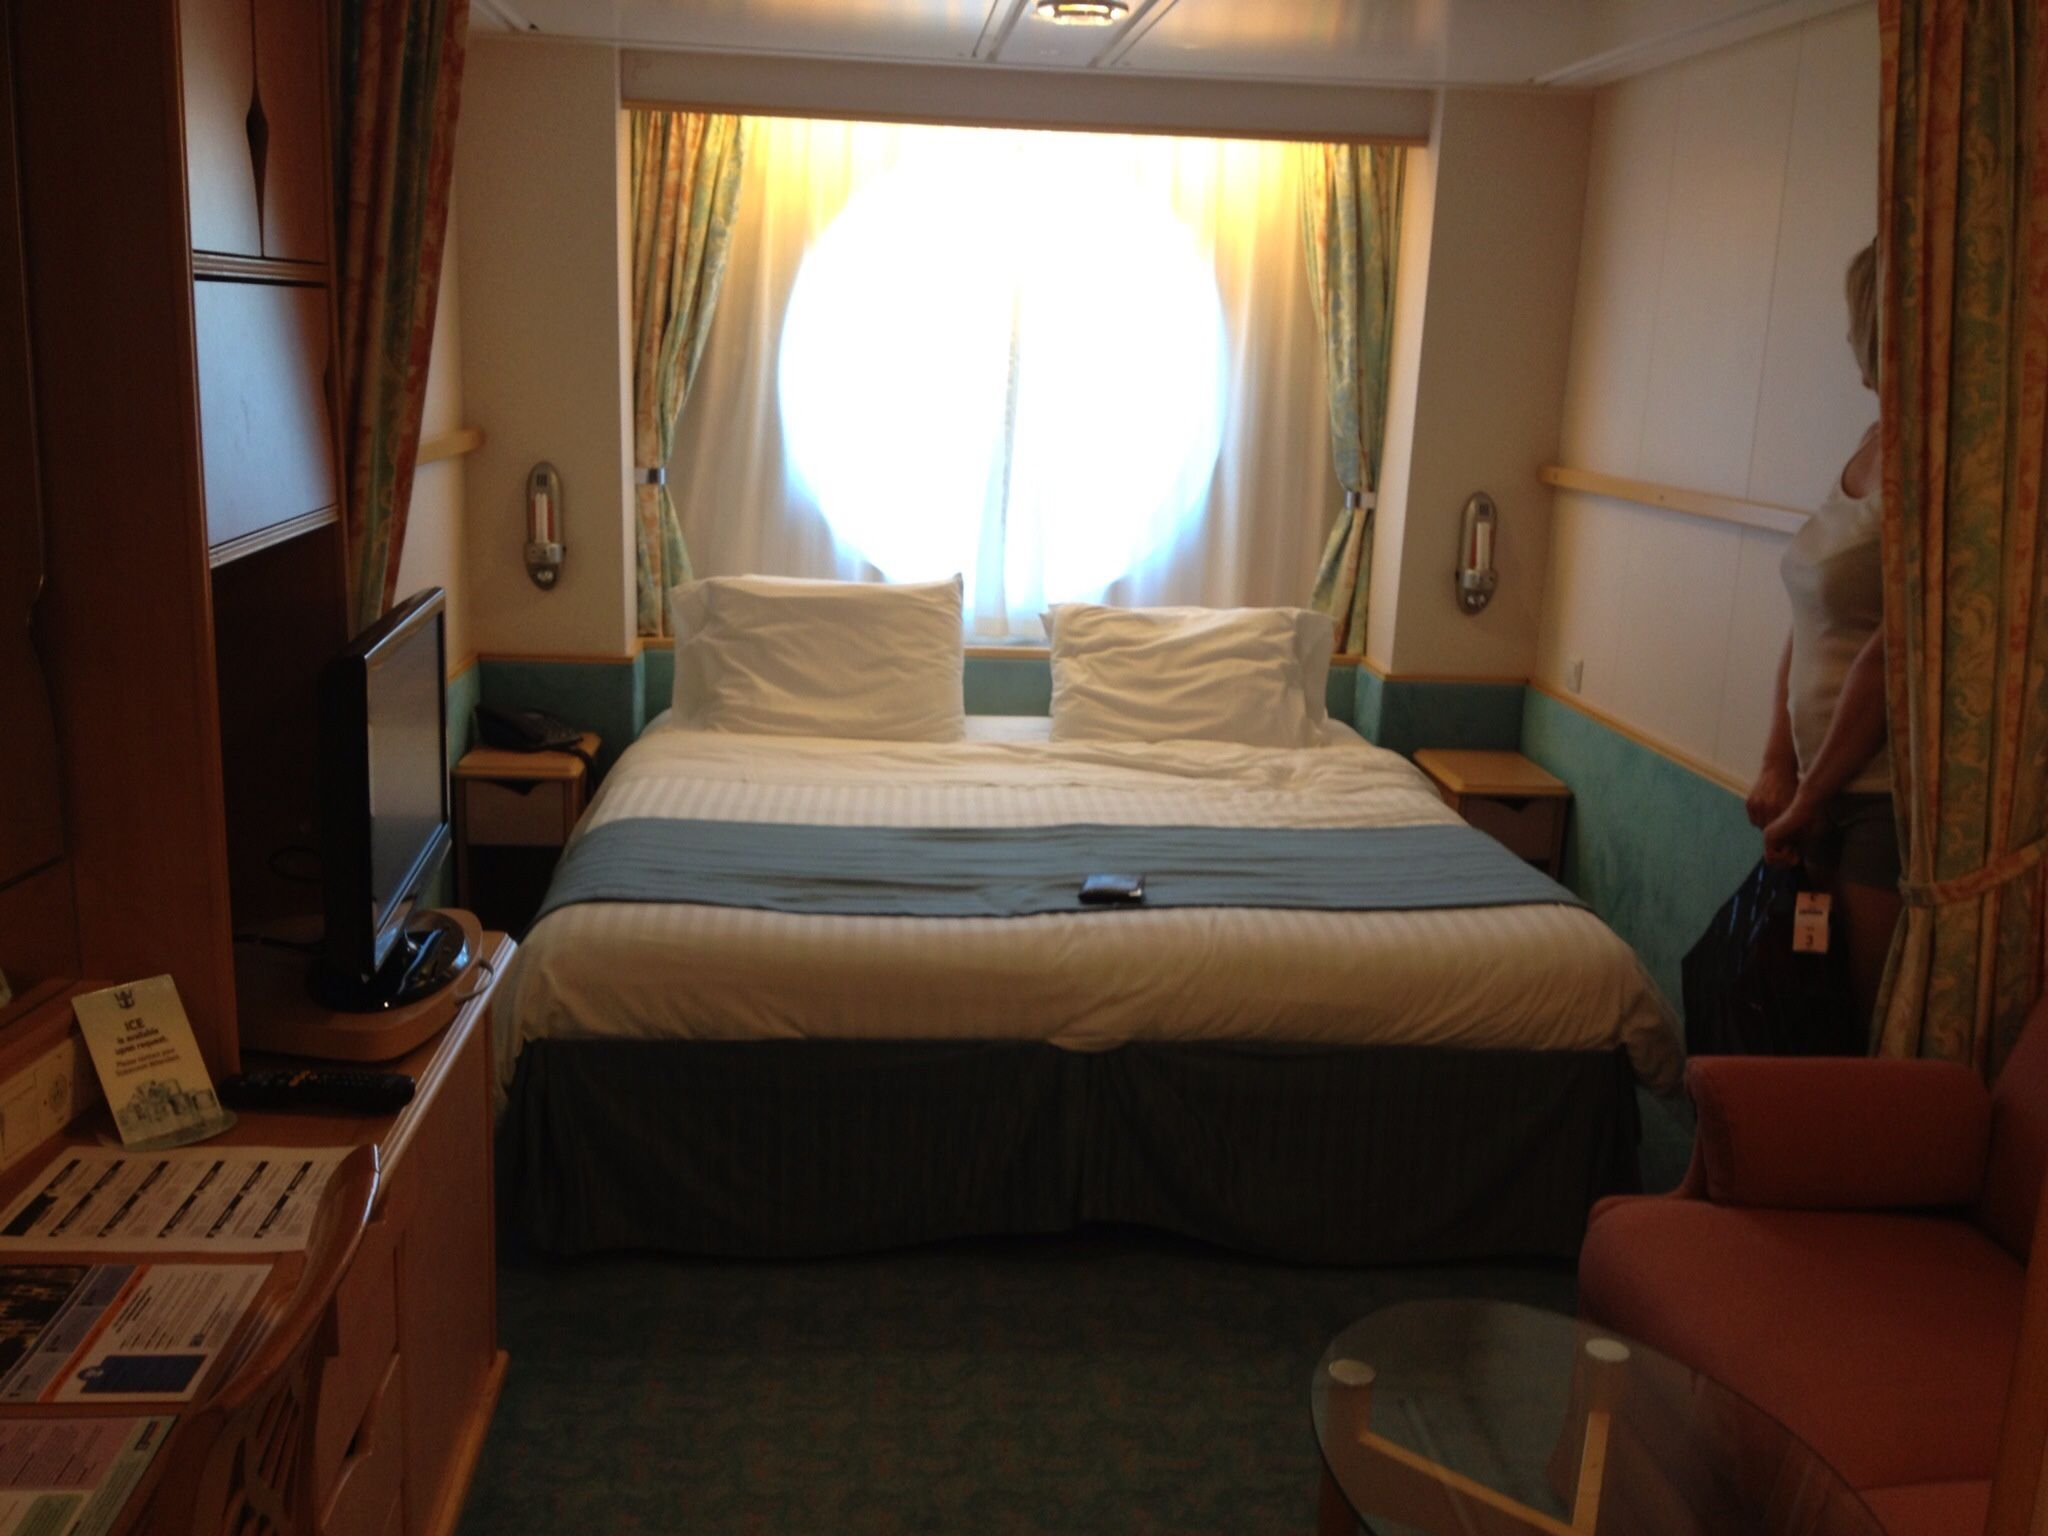 Royal Caribbean Adventure of the Seas Oceanview Cabin